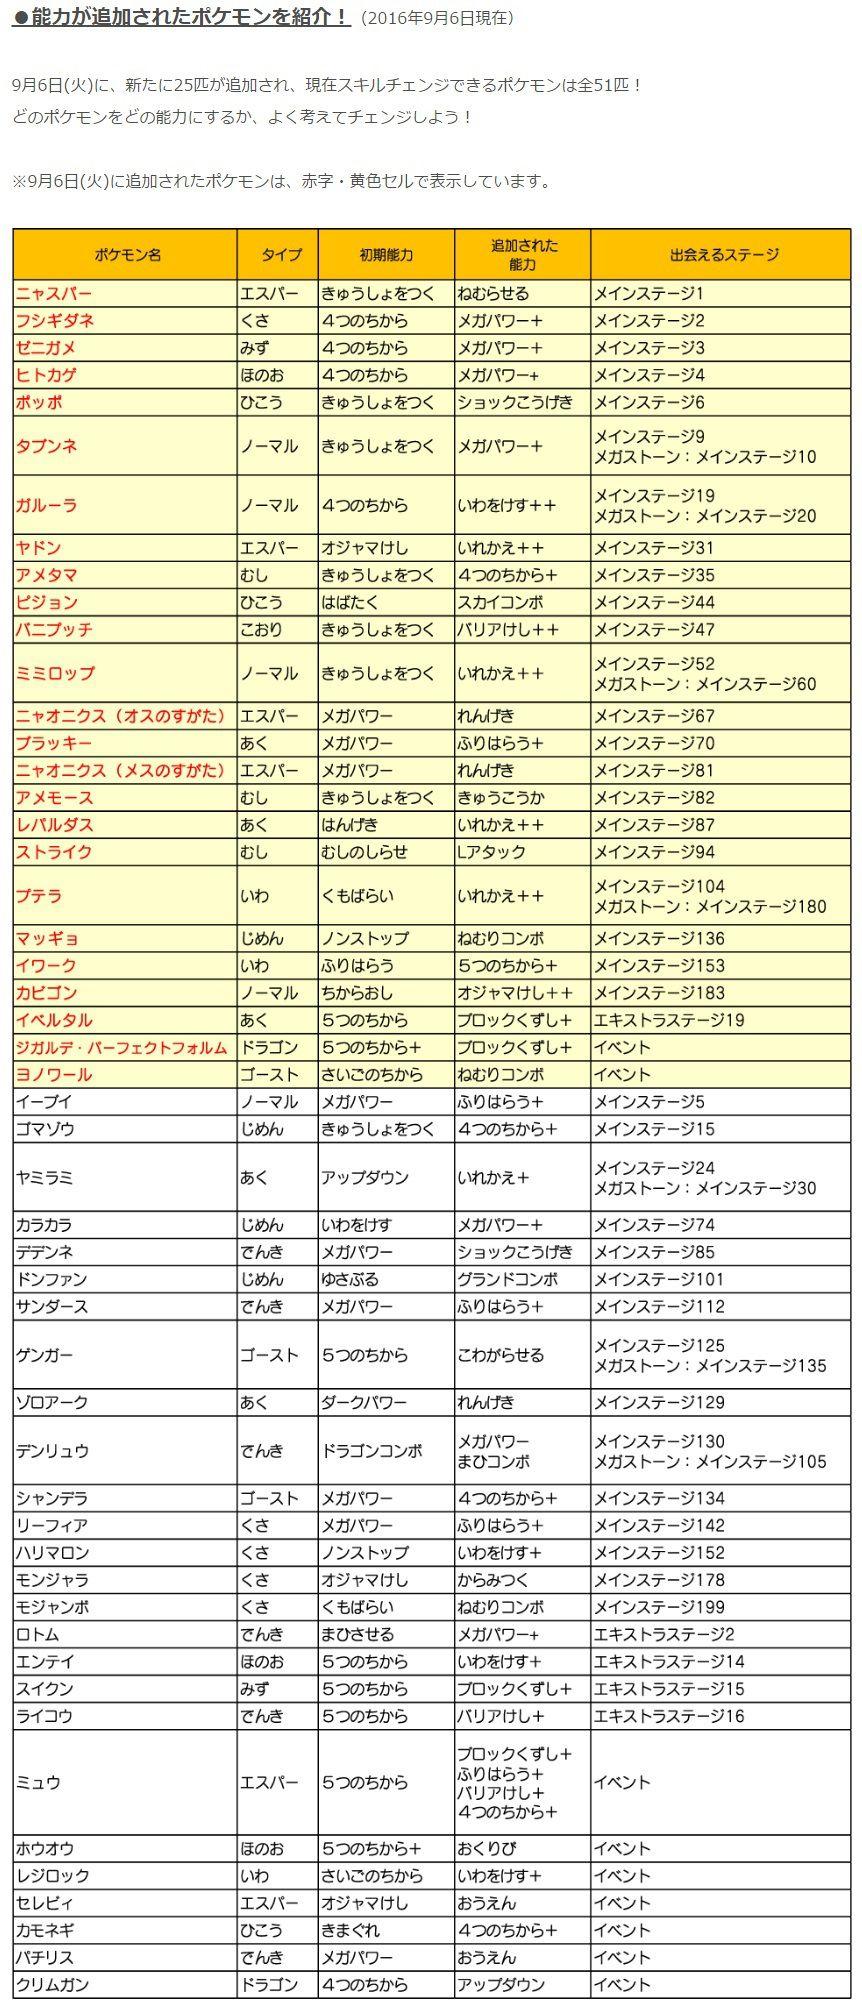 image_6353.jpg